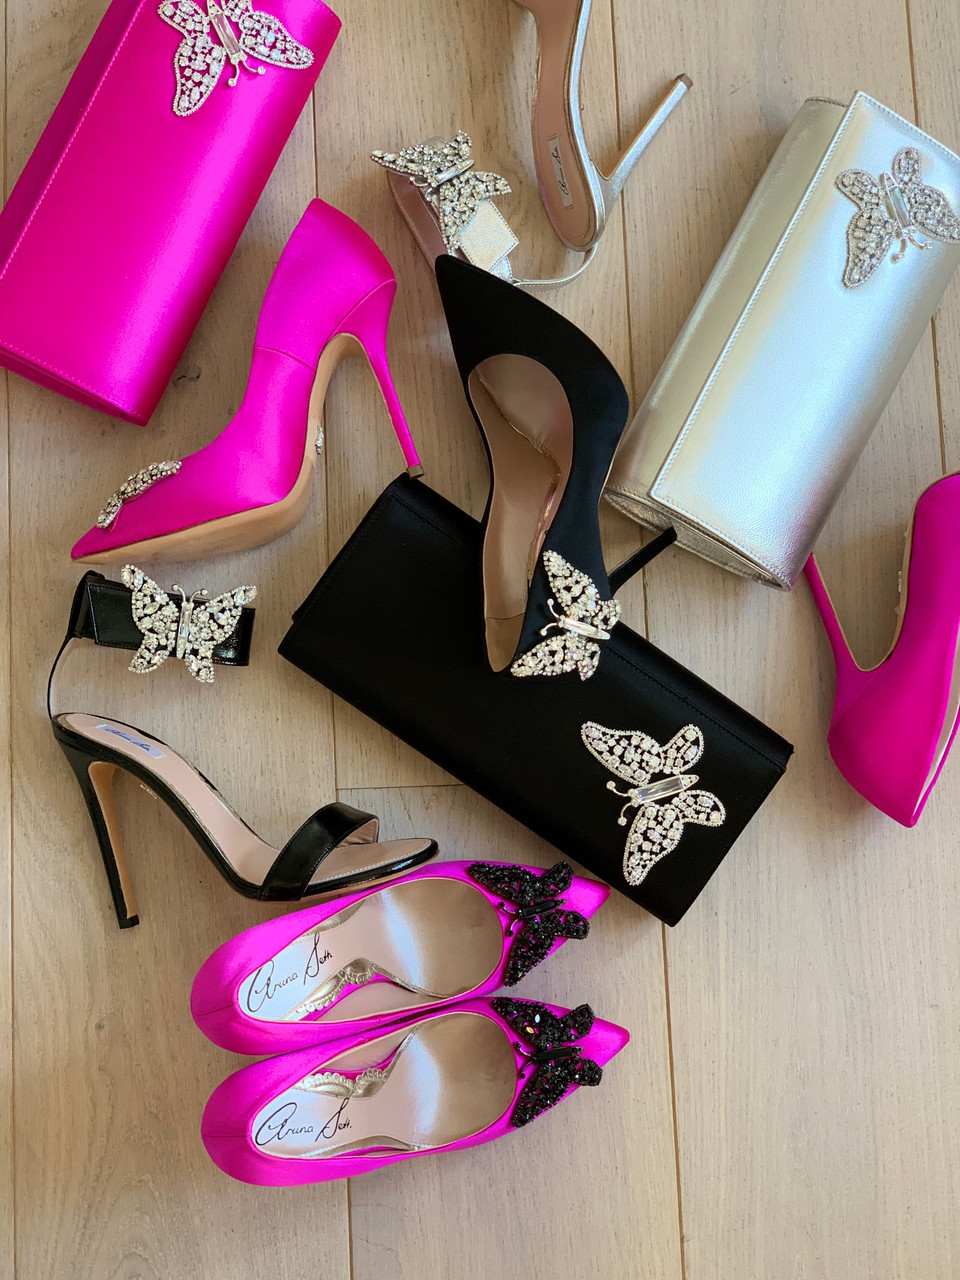 April Farfalla Stiletto Neon Pink Satin Black Crystal